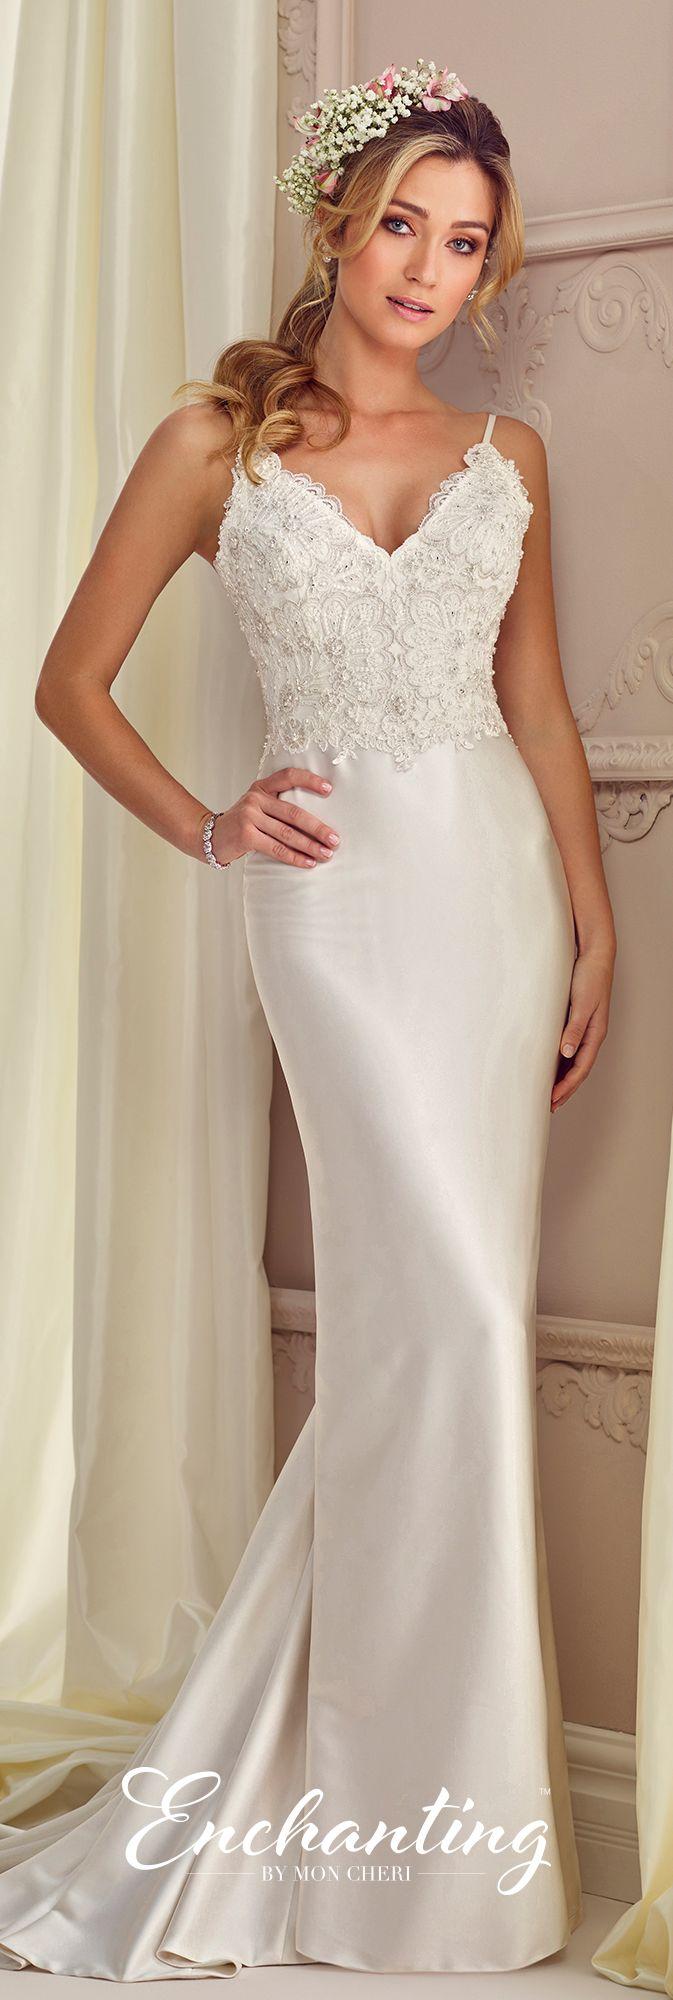 217110 85 best Formfitting Wedding Dress images